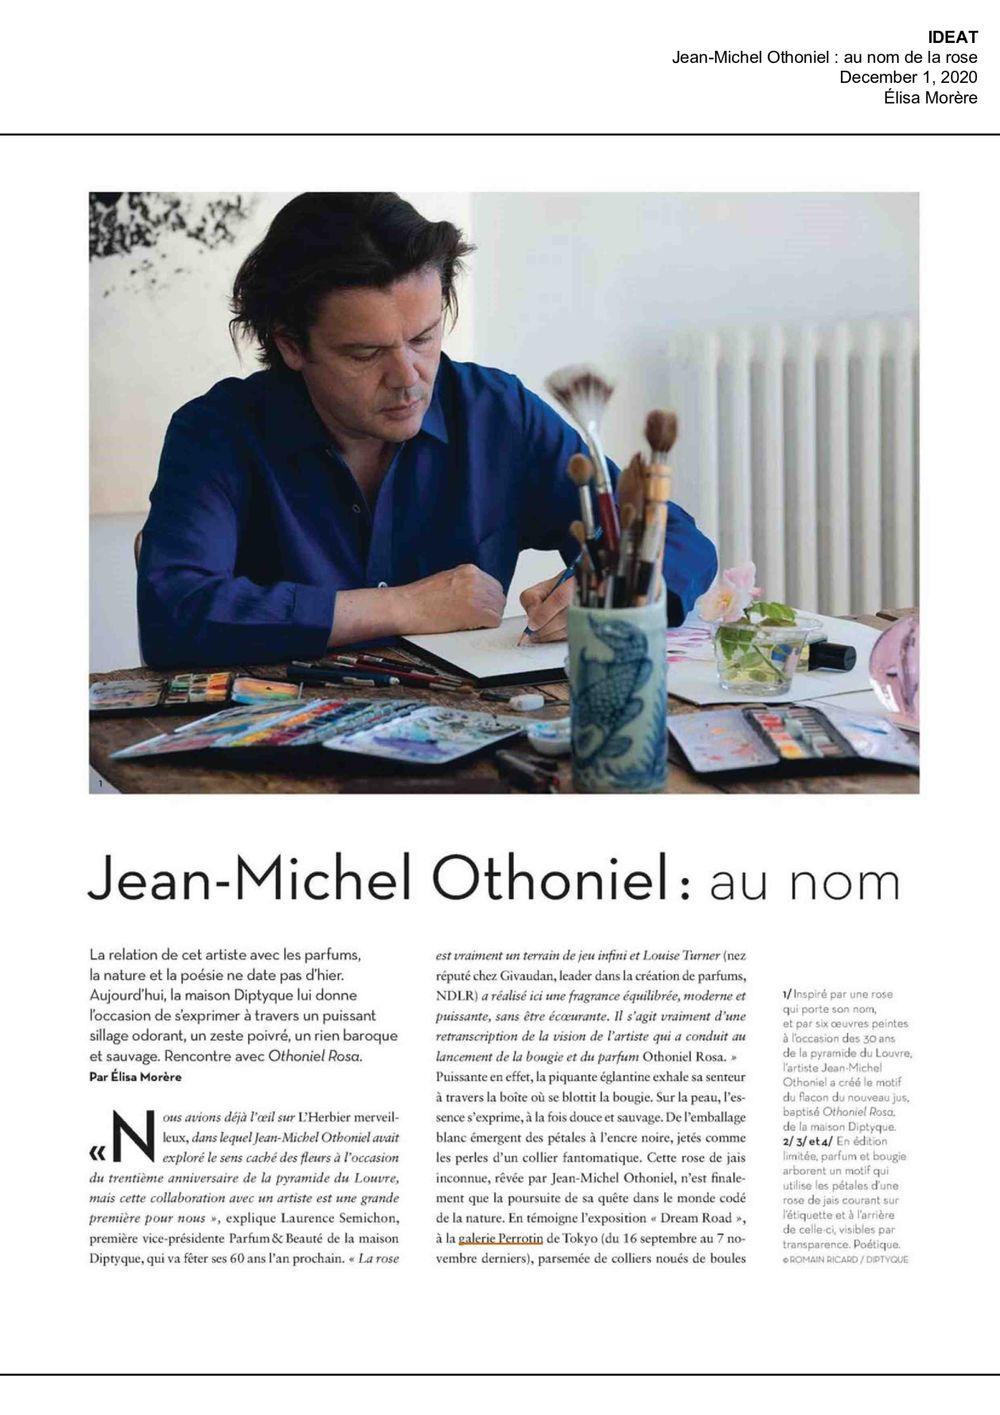 IDEAT | Jean-Michel OTHONIEL